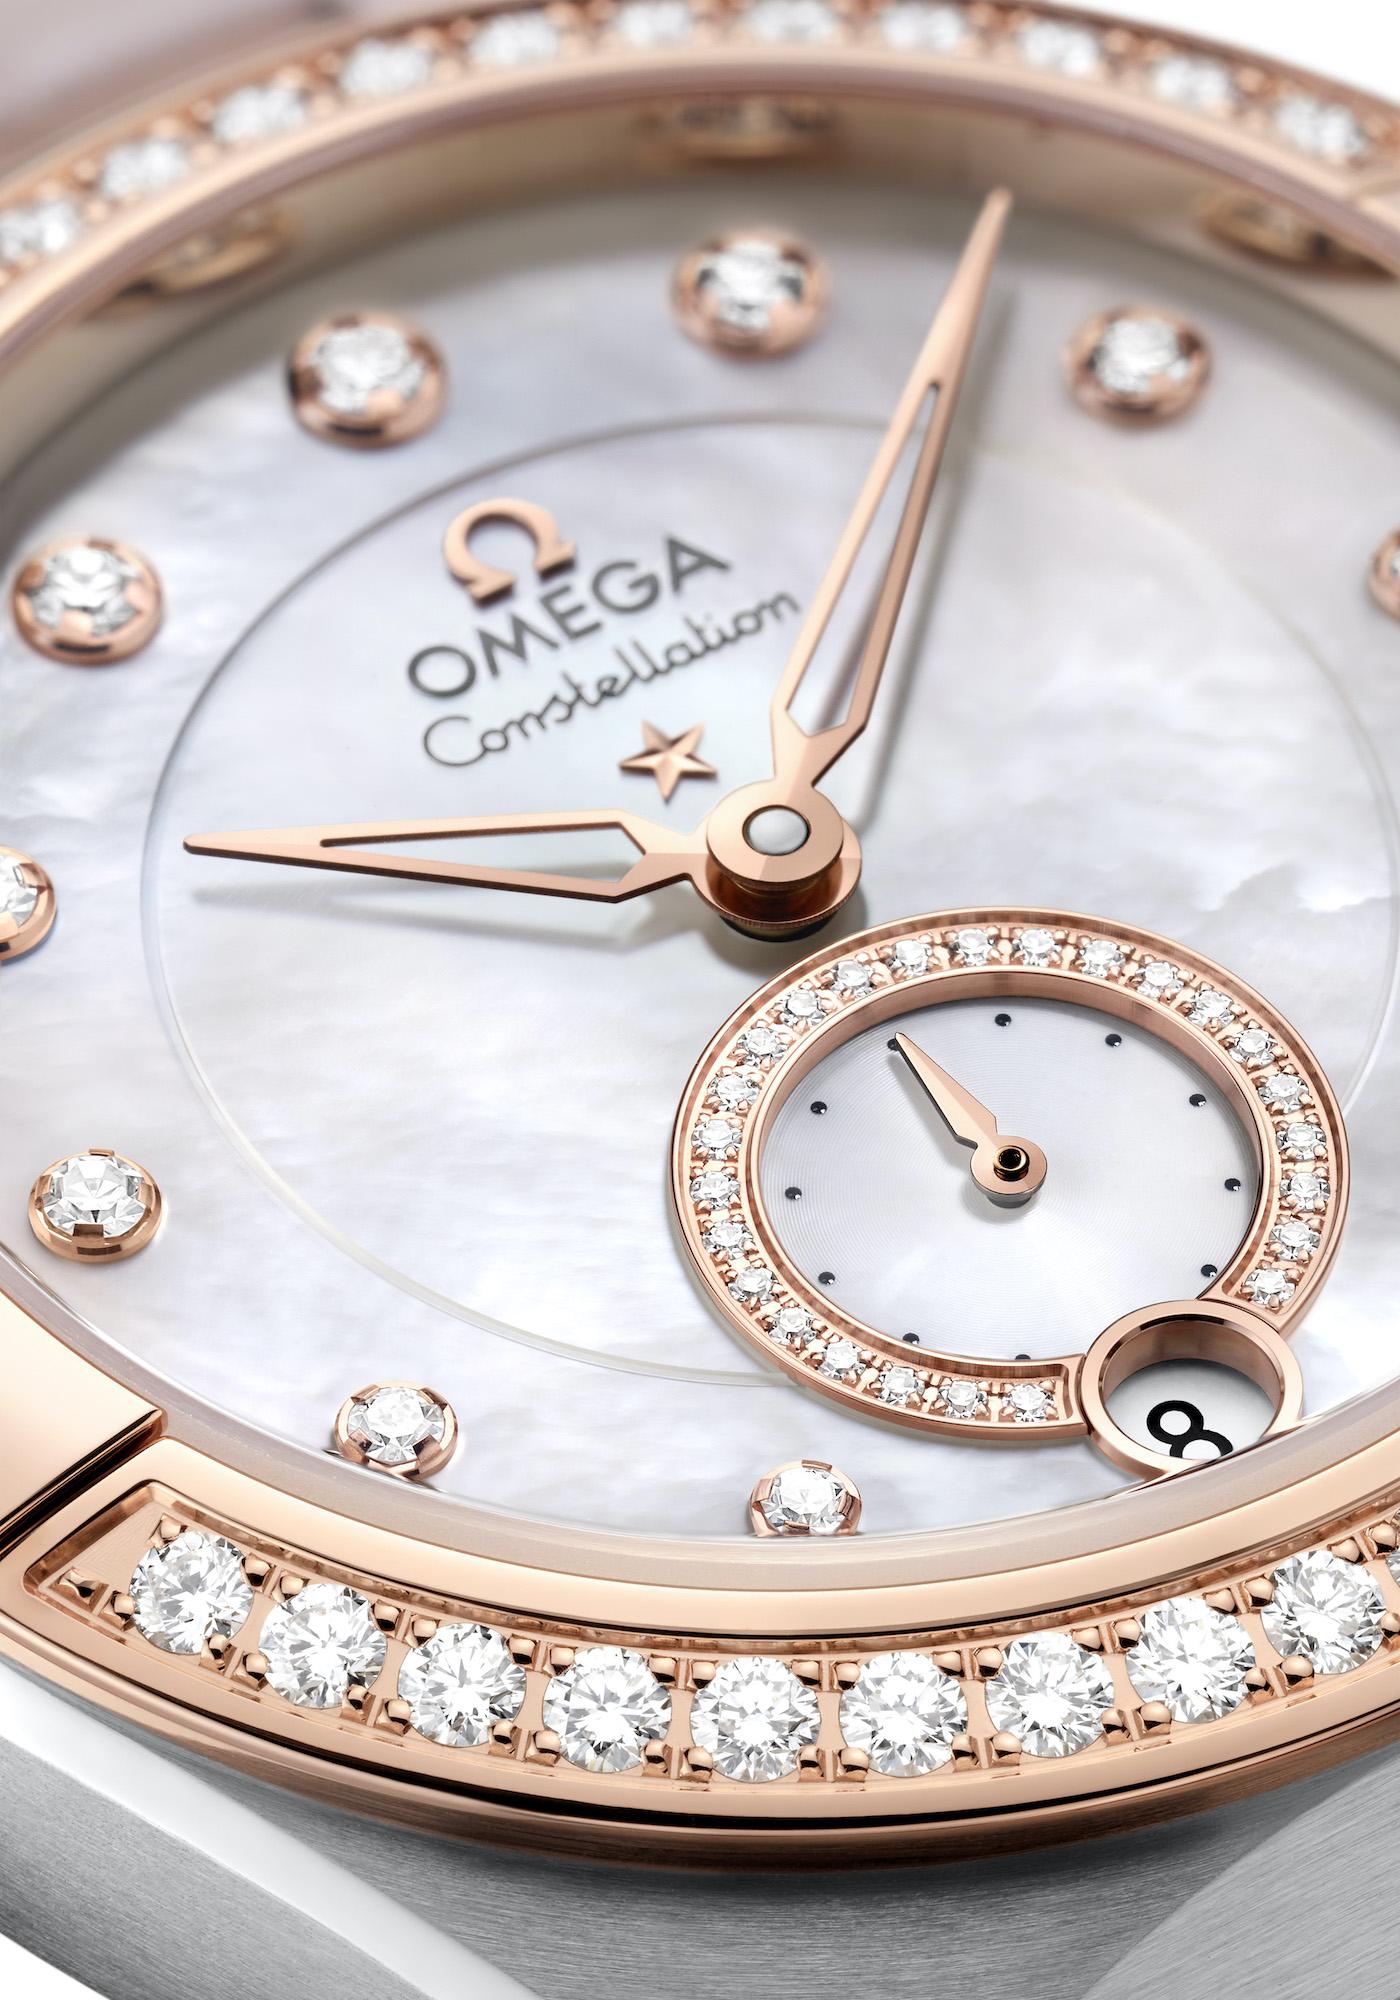 Omega Constellation Small Seconds 131.28.34.20.55.001 detalle esfera